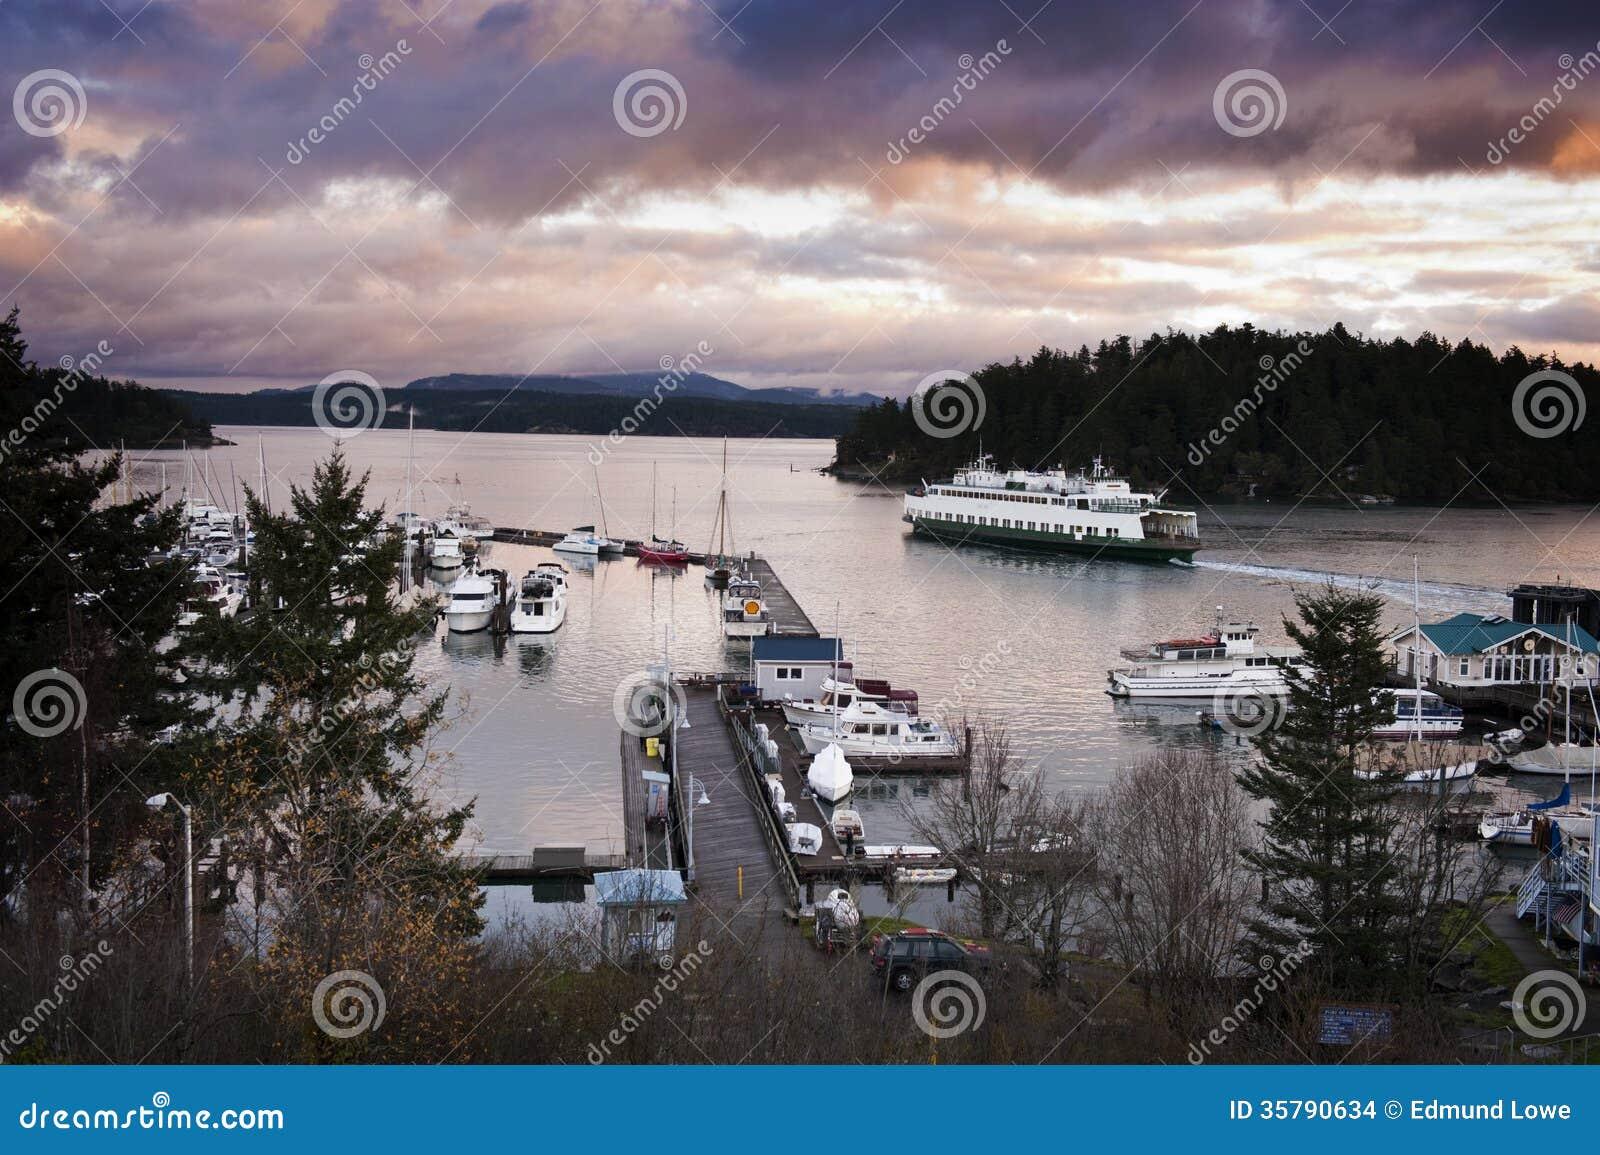 Vrijdaghaven, San Juan Island, Washington.